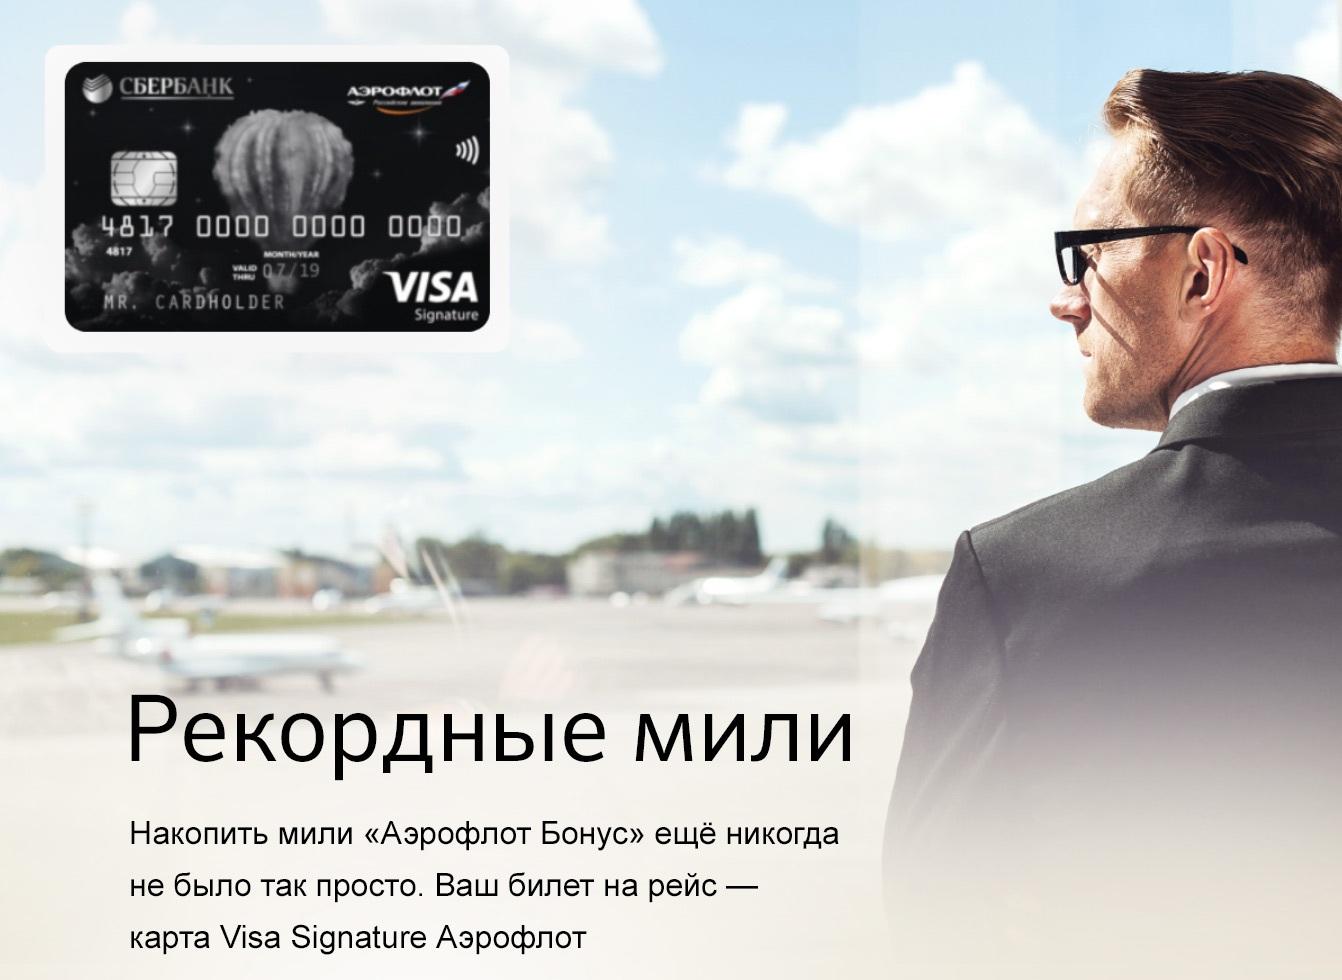 Карта сбербанка visa signature аэрофлот